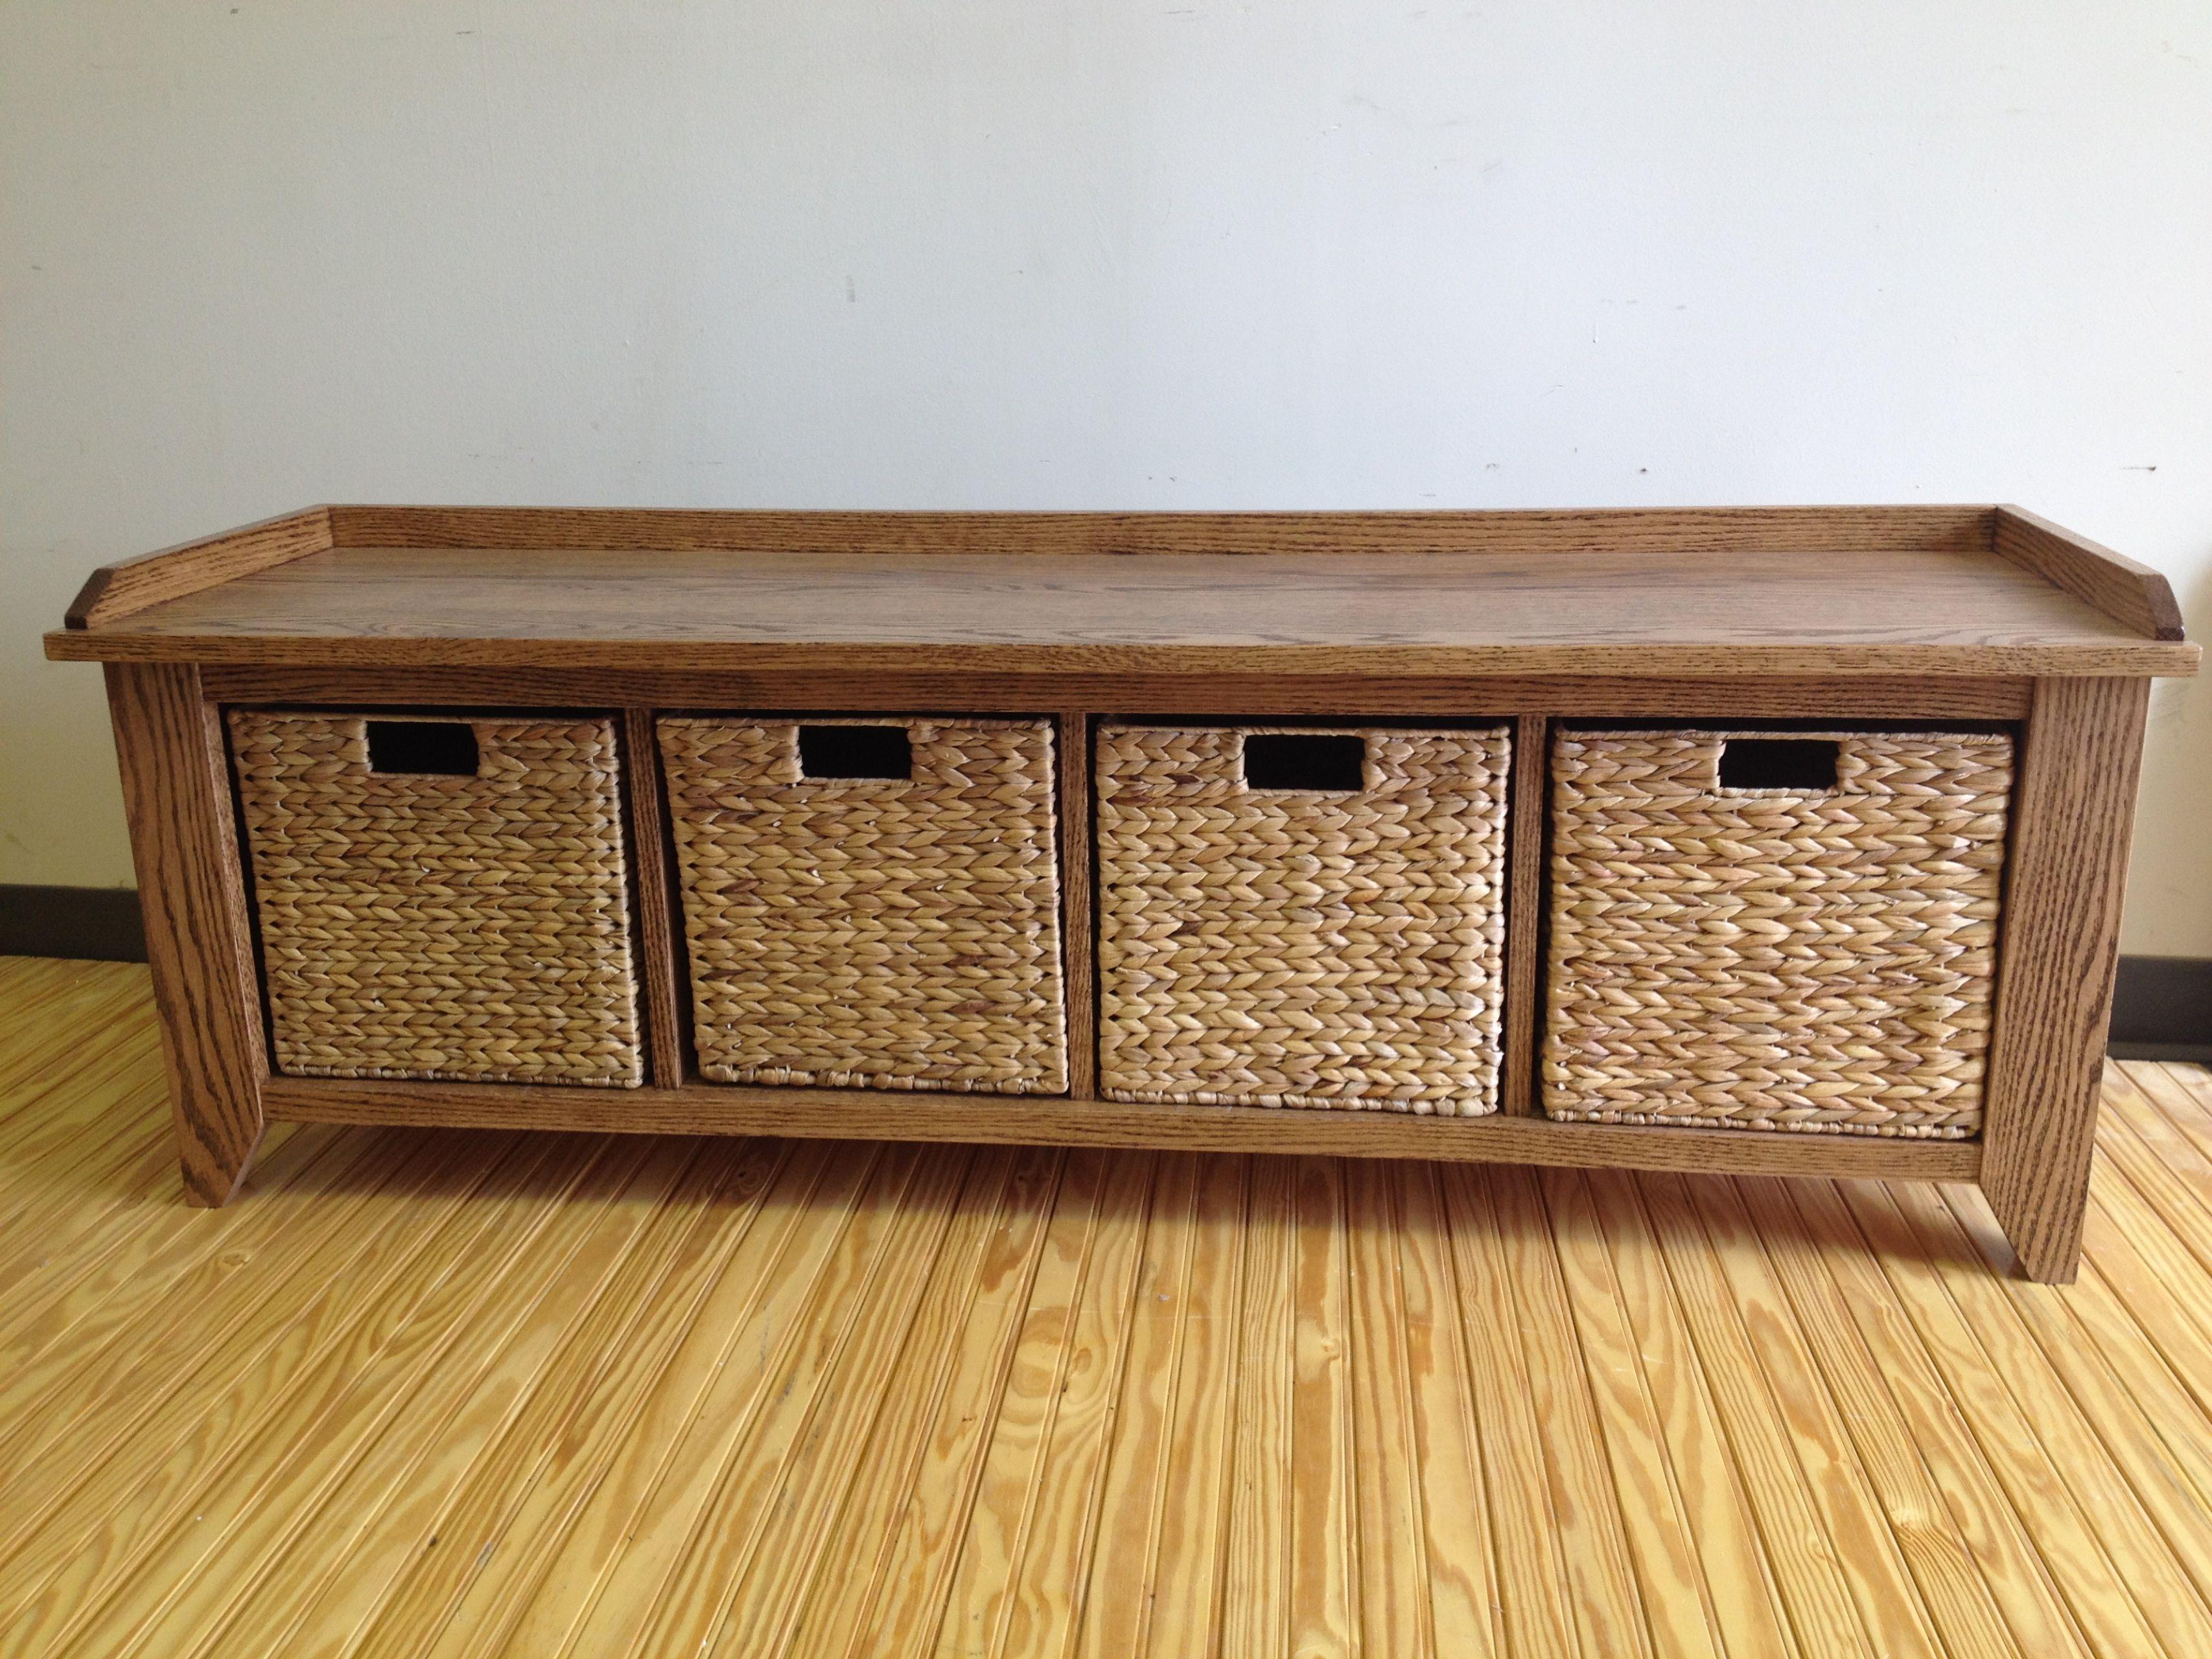 Oak Storage Bench With Large Basket